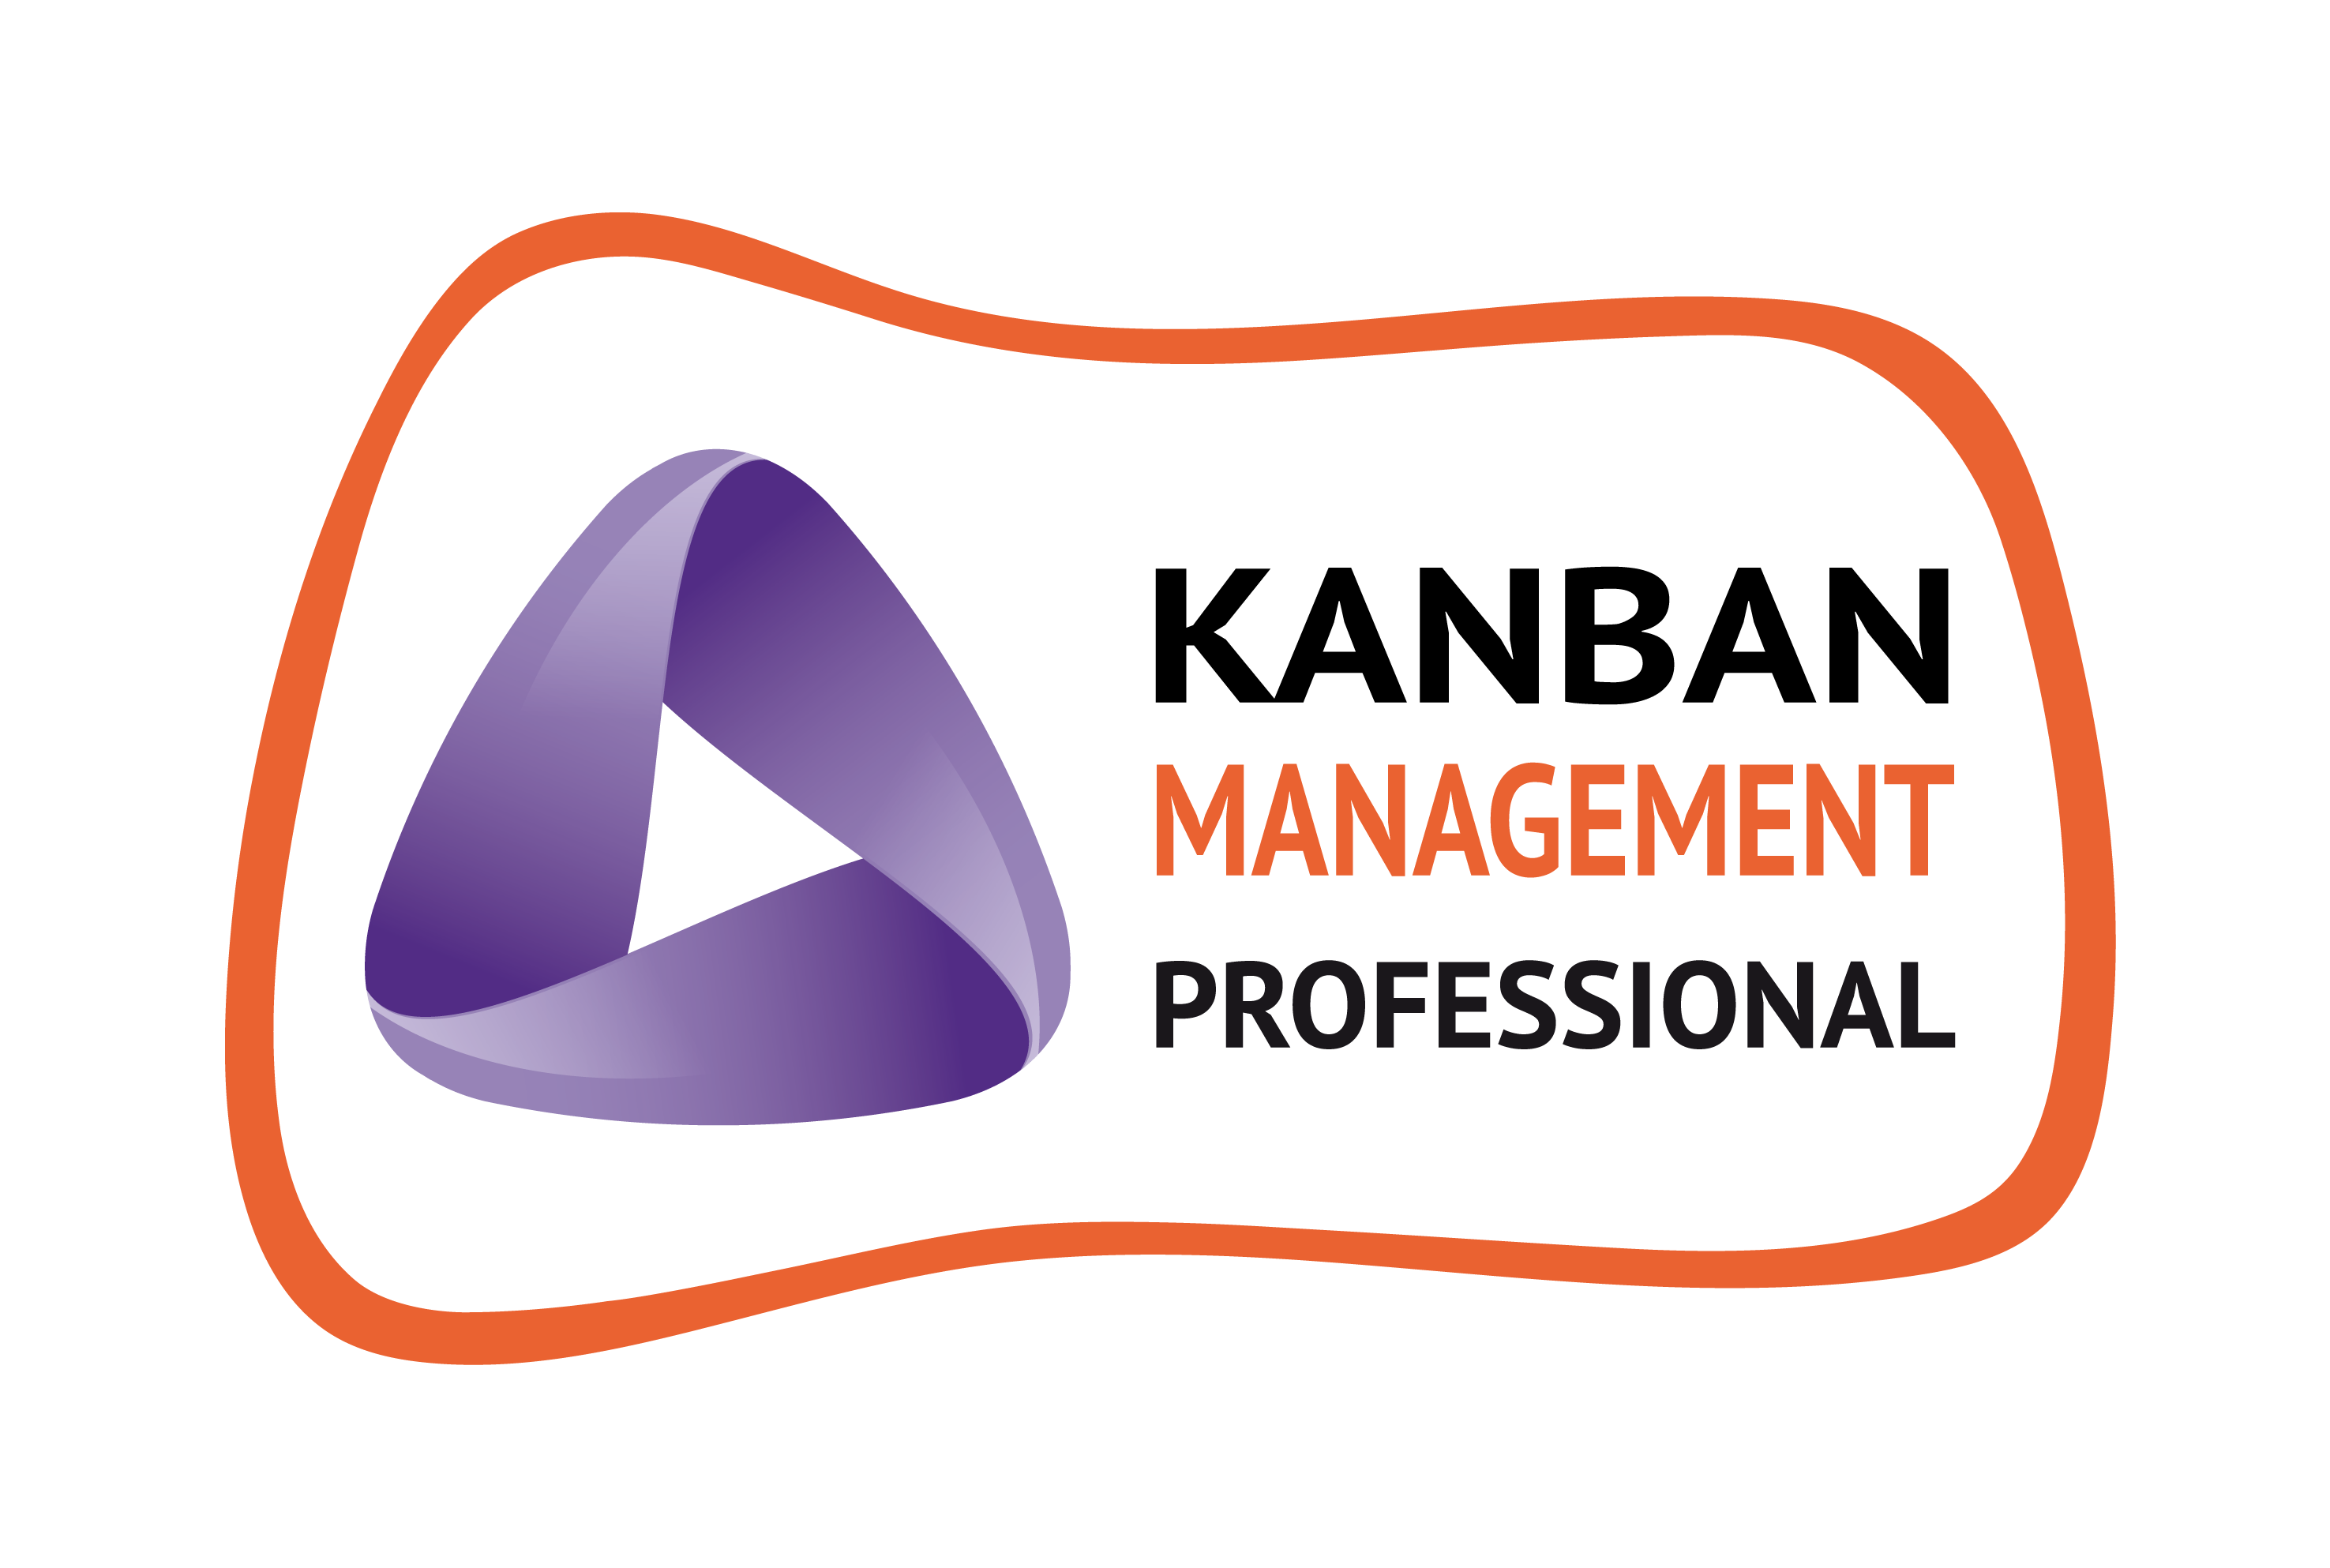 Distintivo Kanban Management Professional